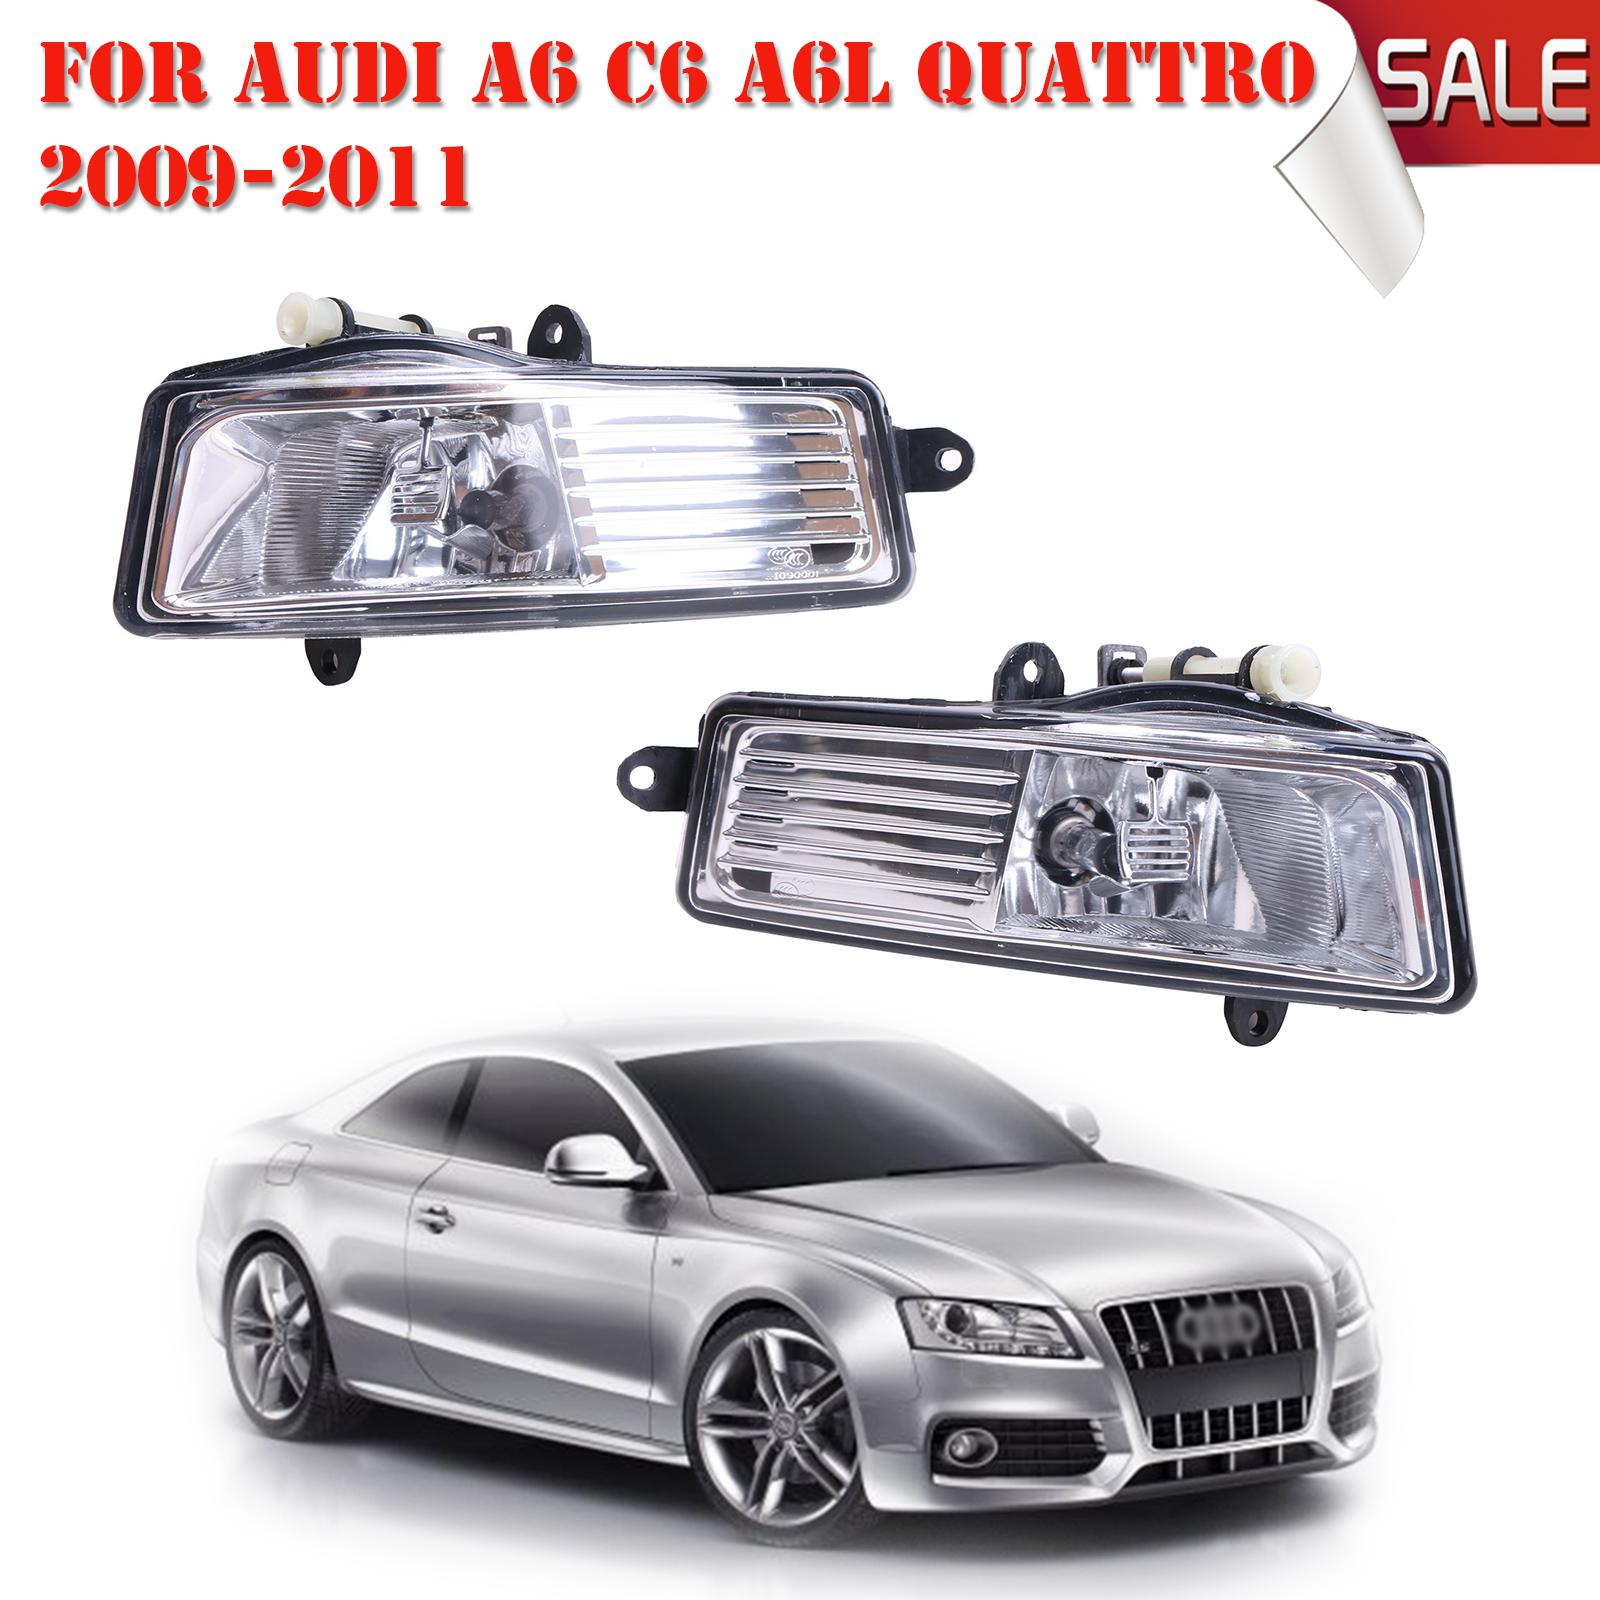 1 Pair Front Fog Lights Foglamps Set For Audi A6 C6 A6L Quattro 2009 2010 2011 4FD941699A + 4FD9416700A Car-Styling #P313 0001108175 0986018340 458211 new starter for audi a4 a6 quattro volkswagen passat 2 8 3 0 4 2 l